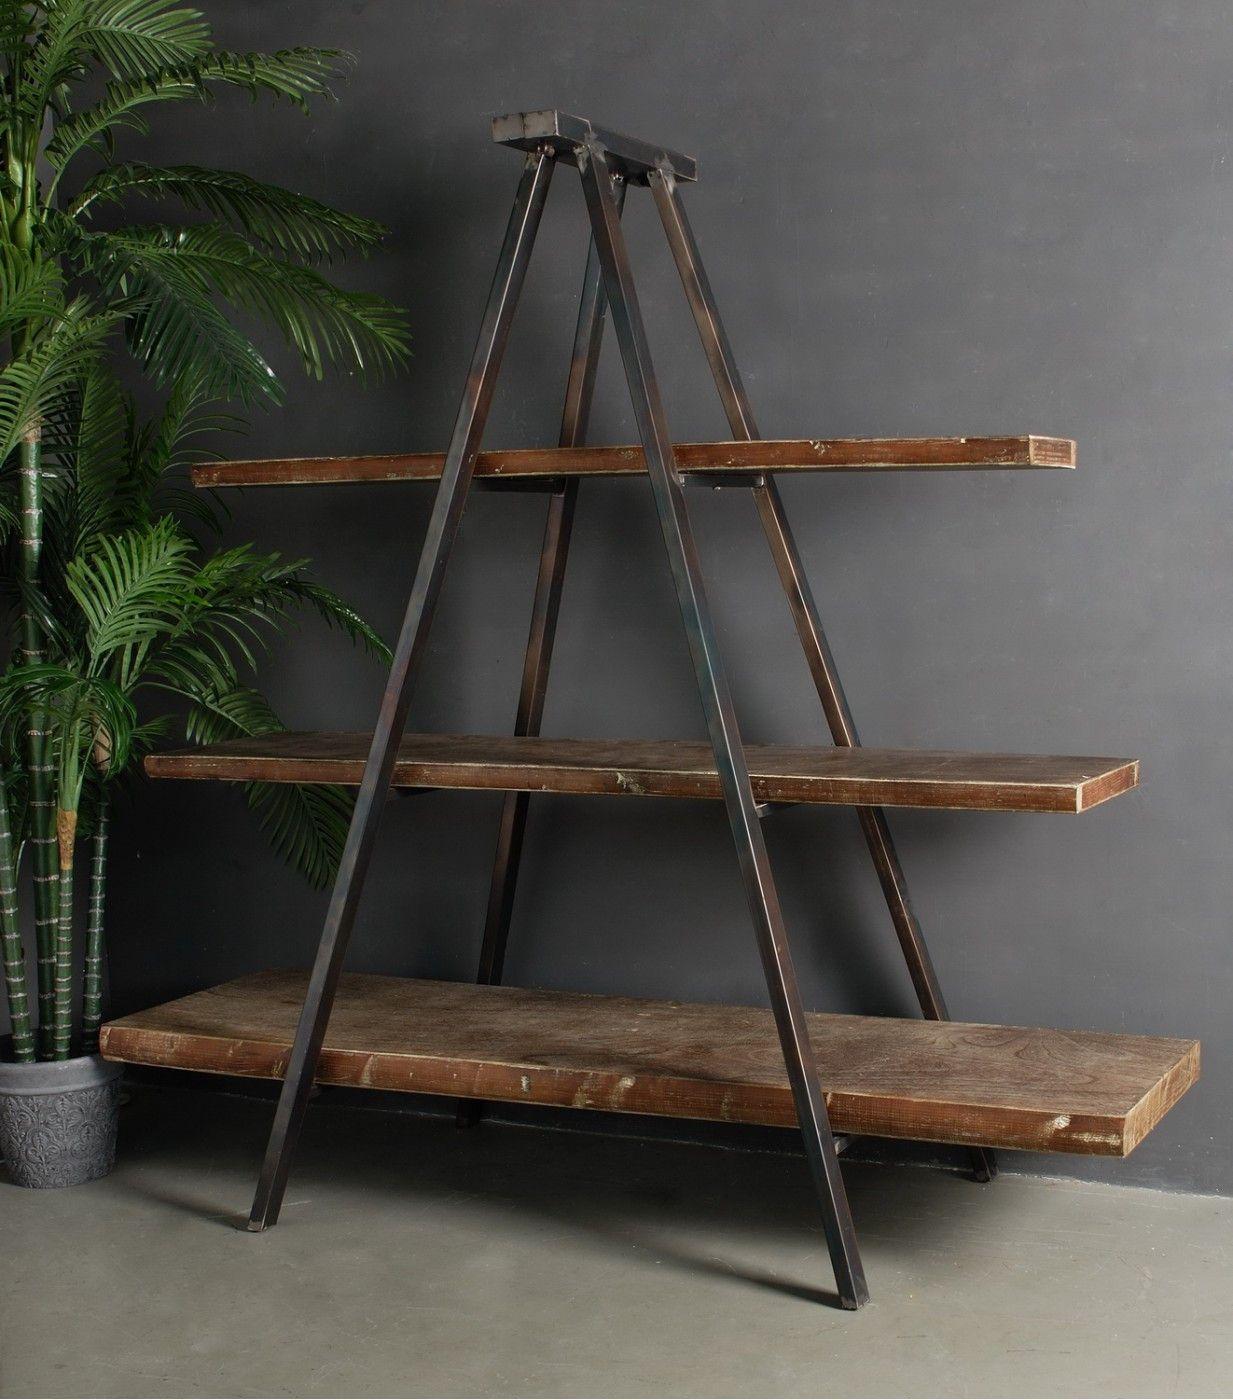 Pin by r schwarzen on möbel pinterest furniture industrial